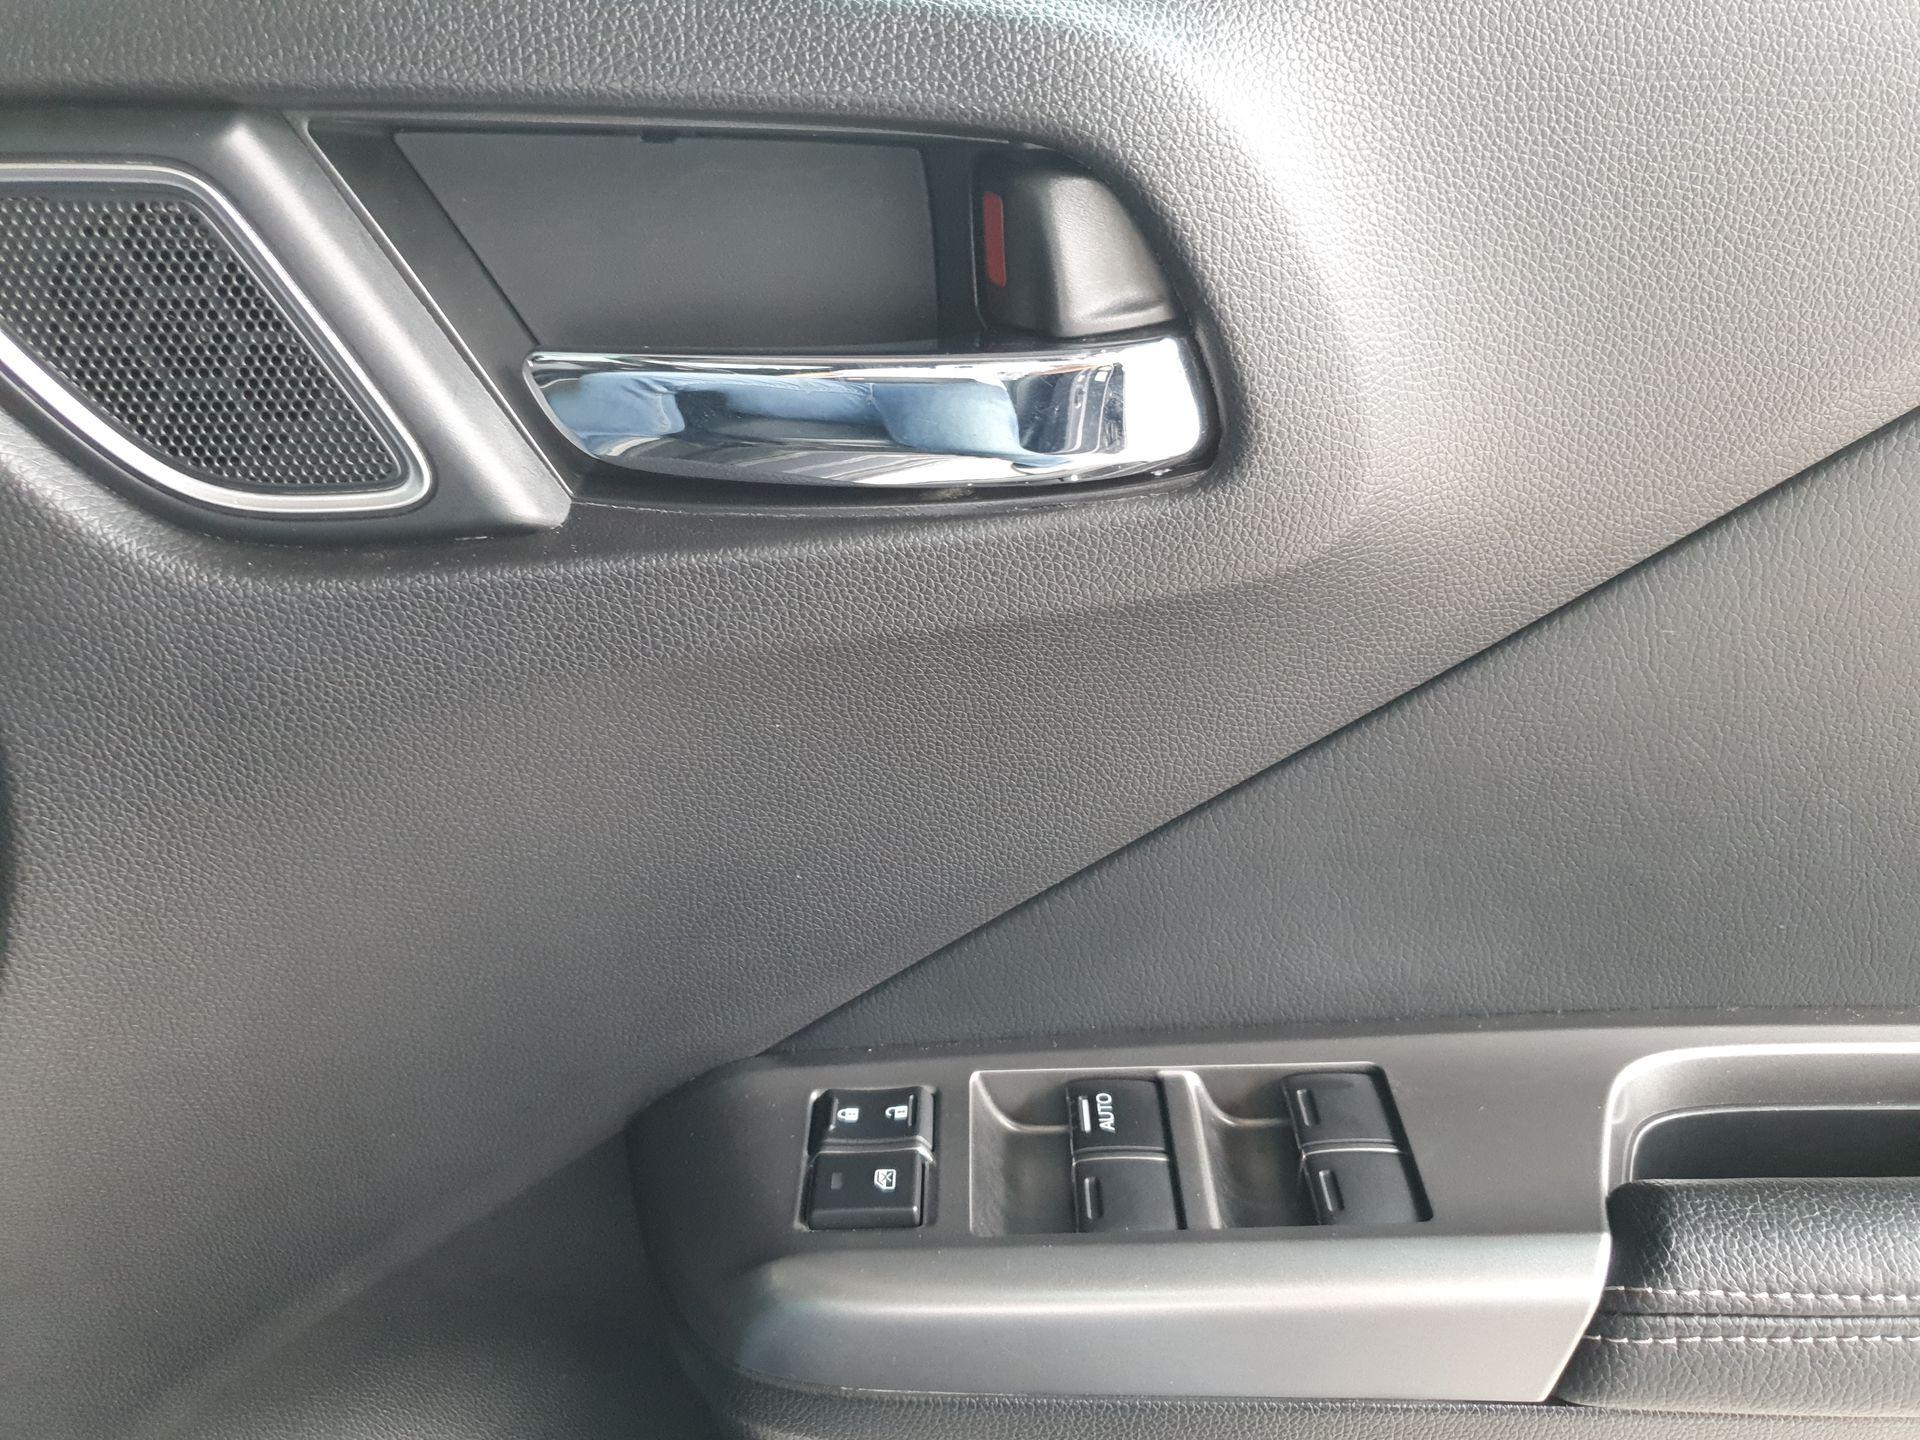 2019 Honda City 1.5L V